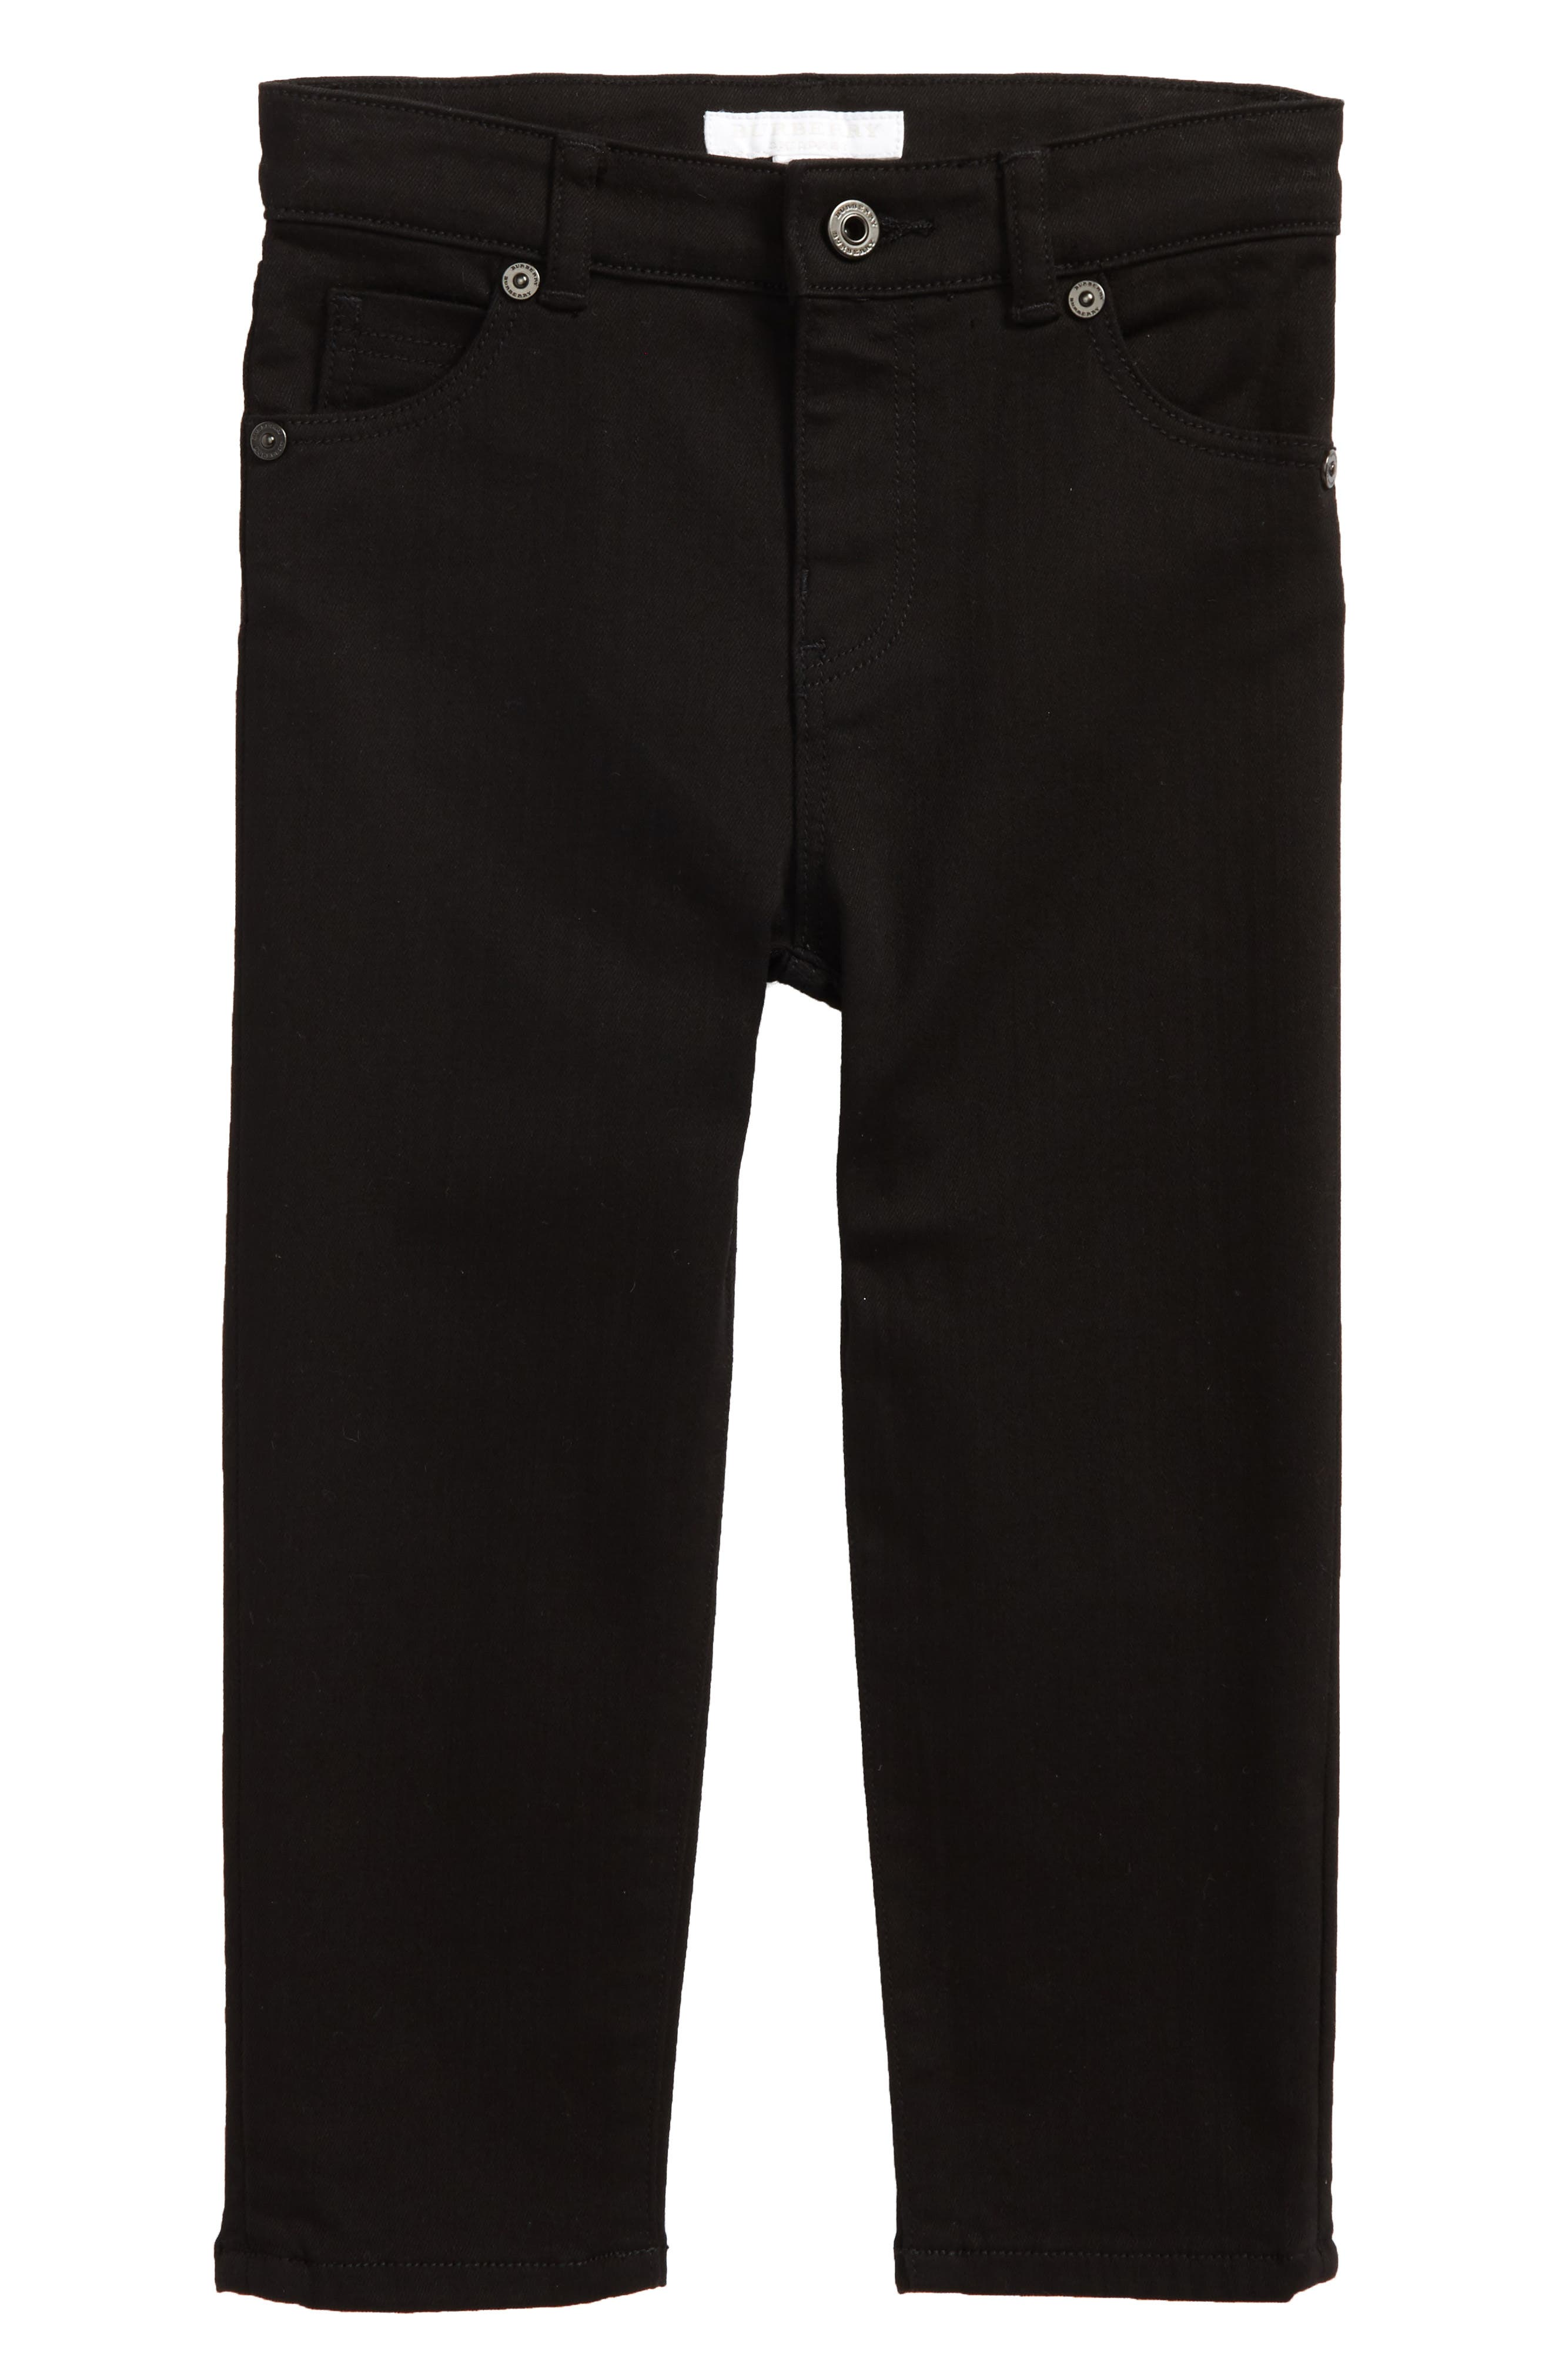 Skinny Jeans,                             Main thumbnail 1, color,                             Black